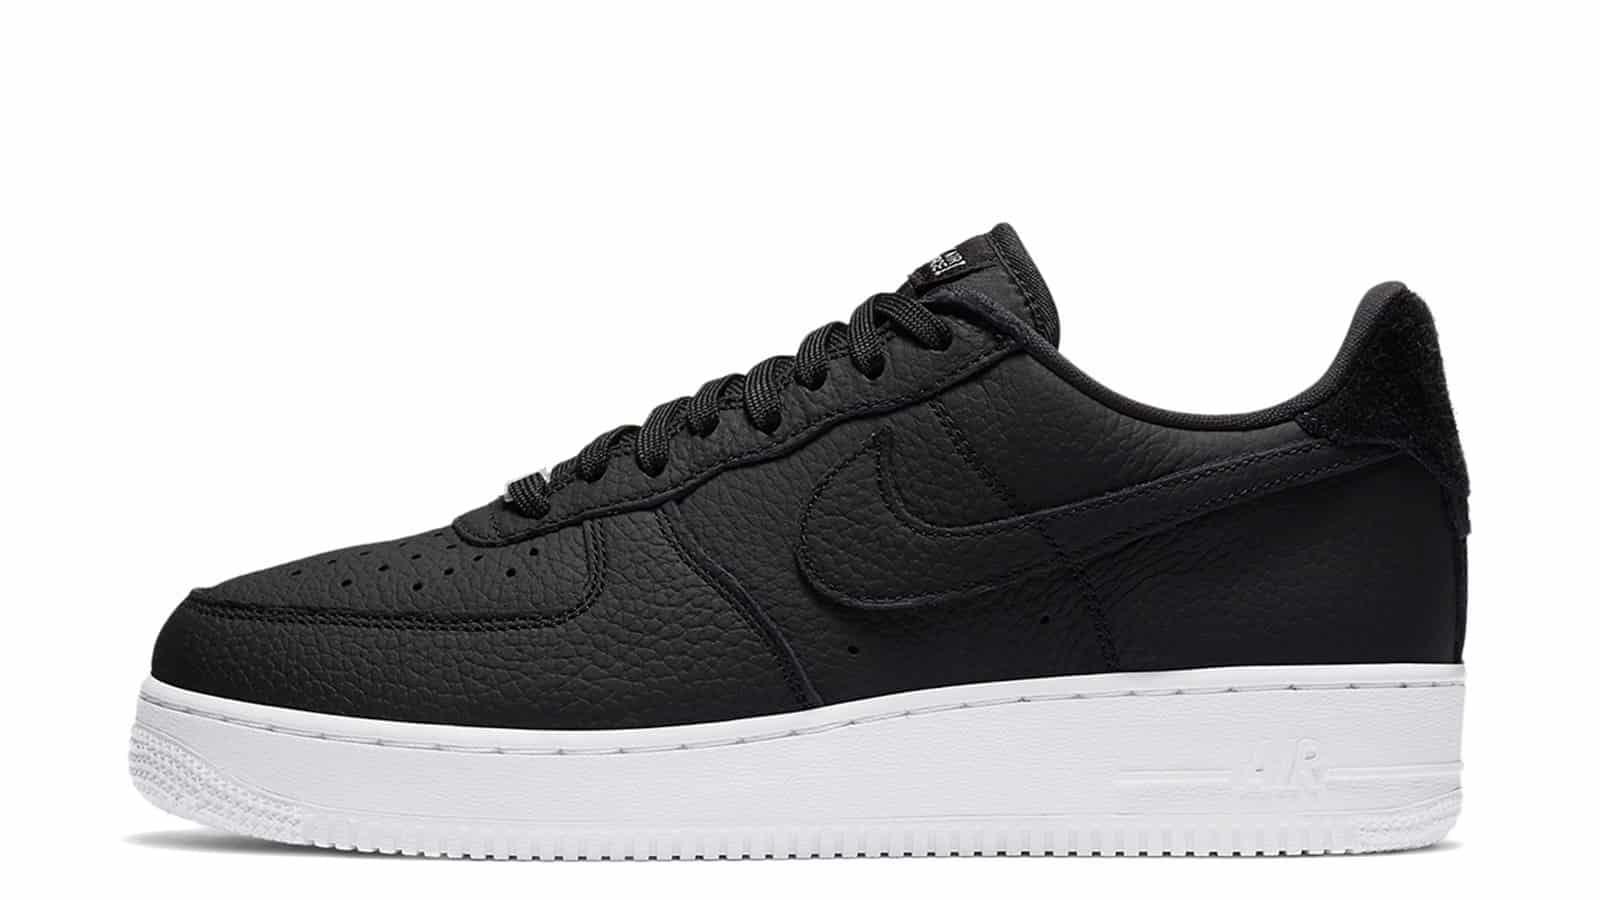 Nike Air Force 1 '07 Craft Black